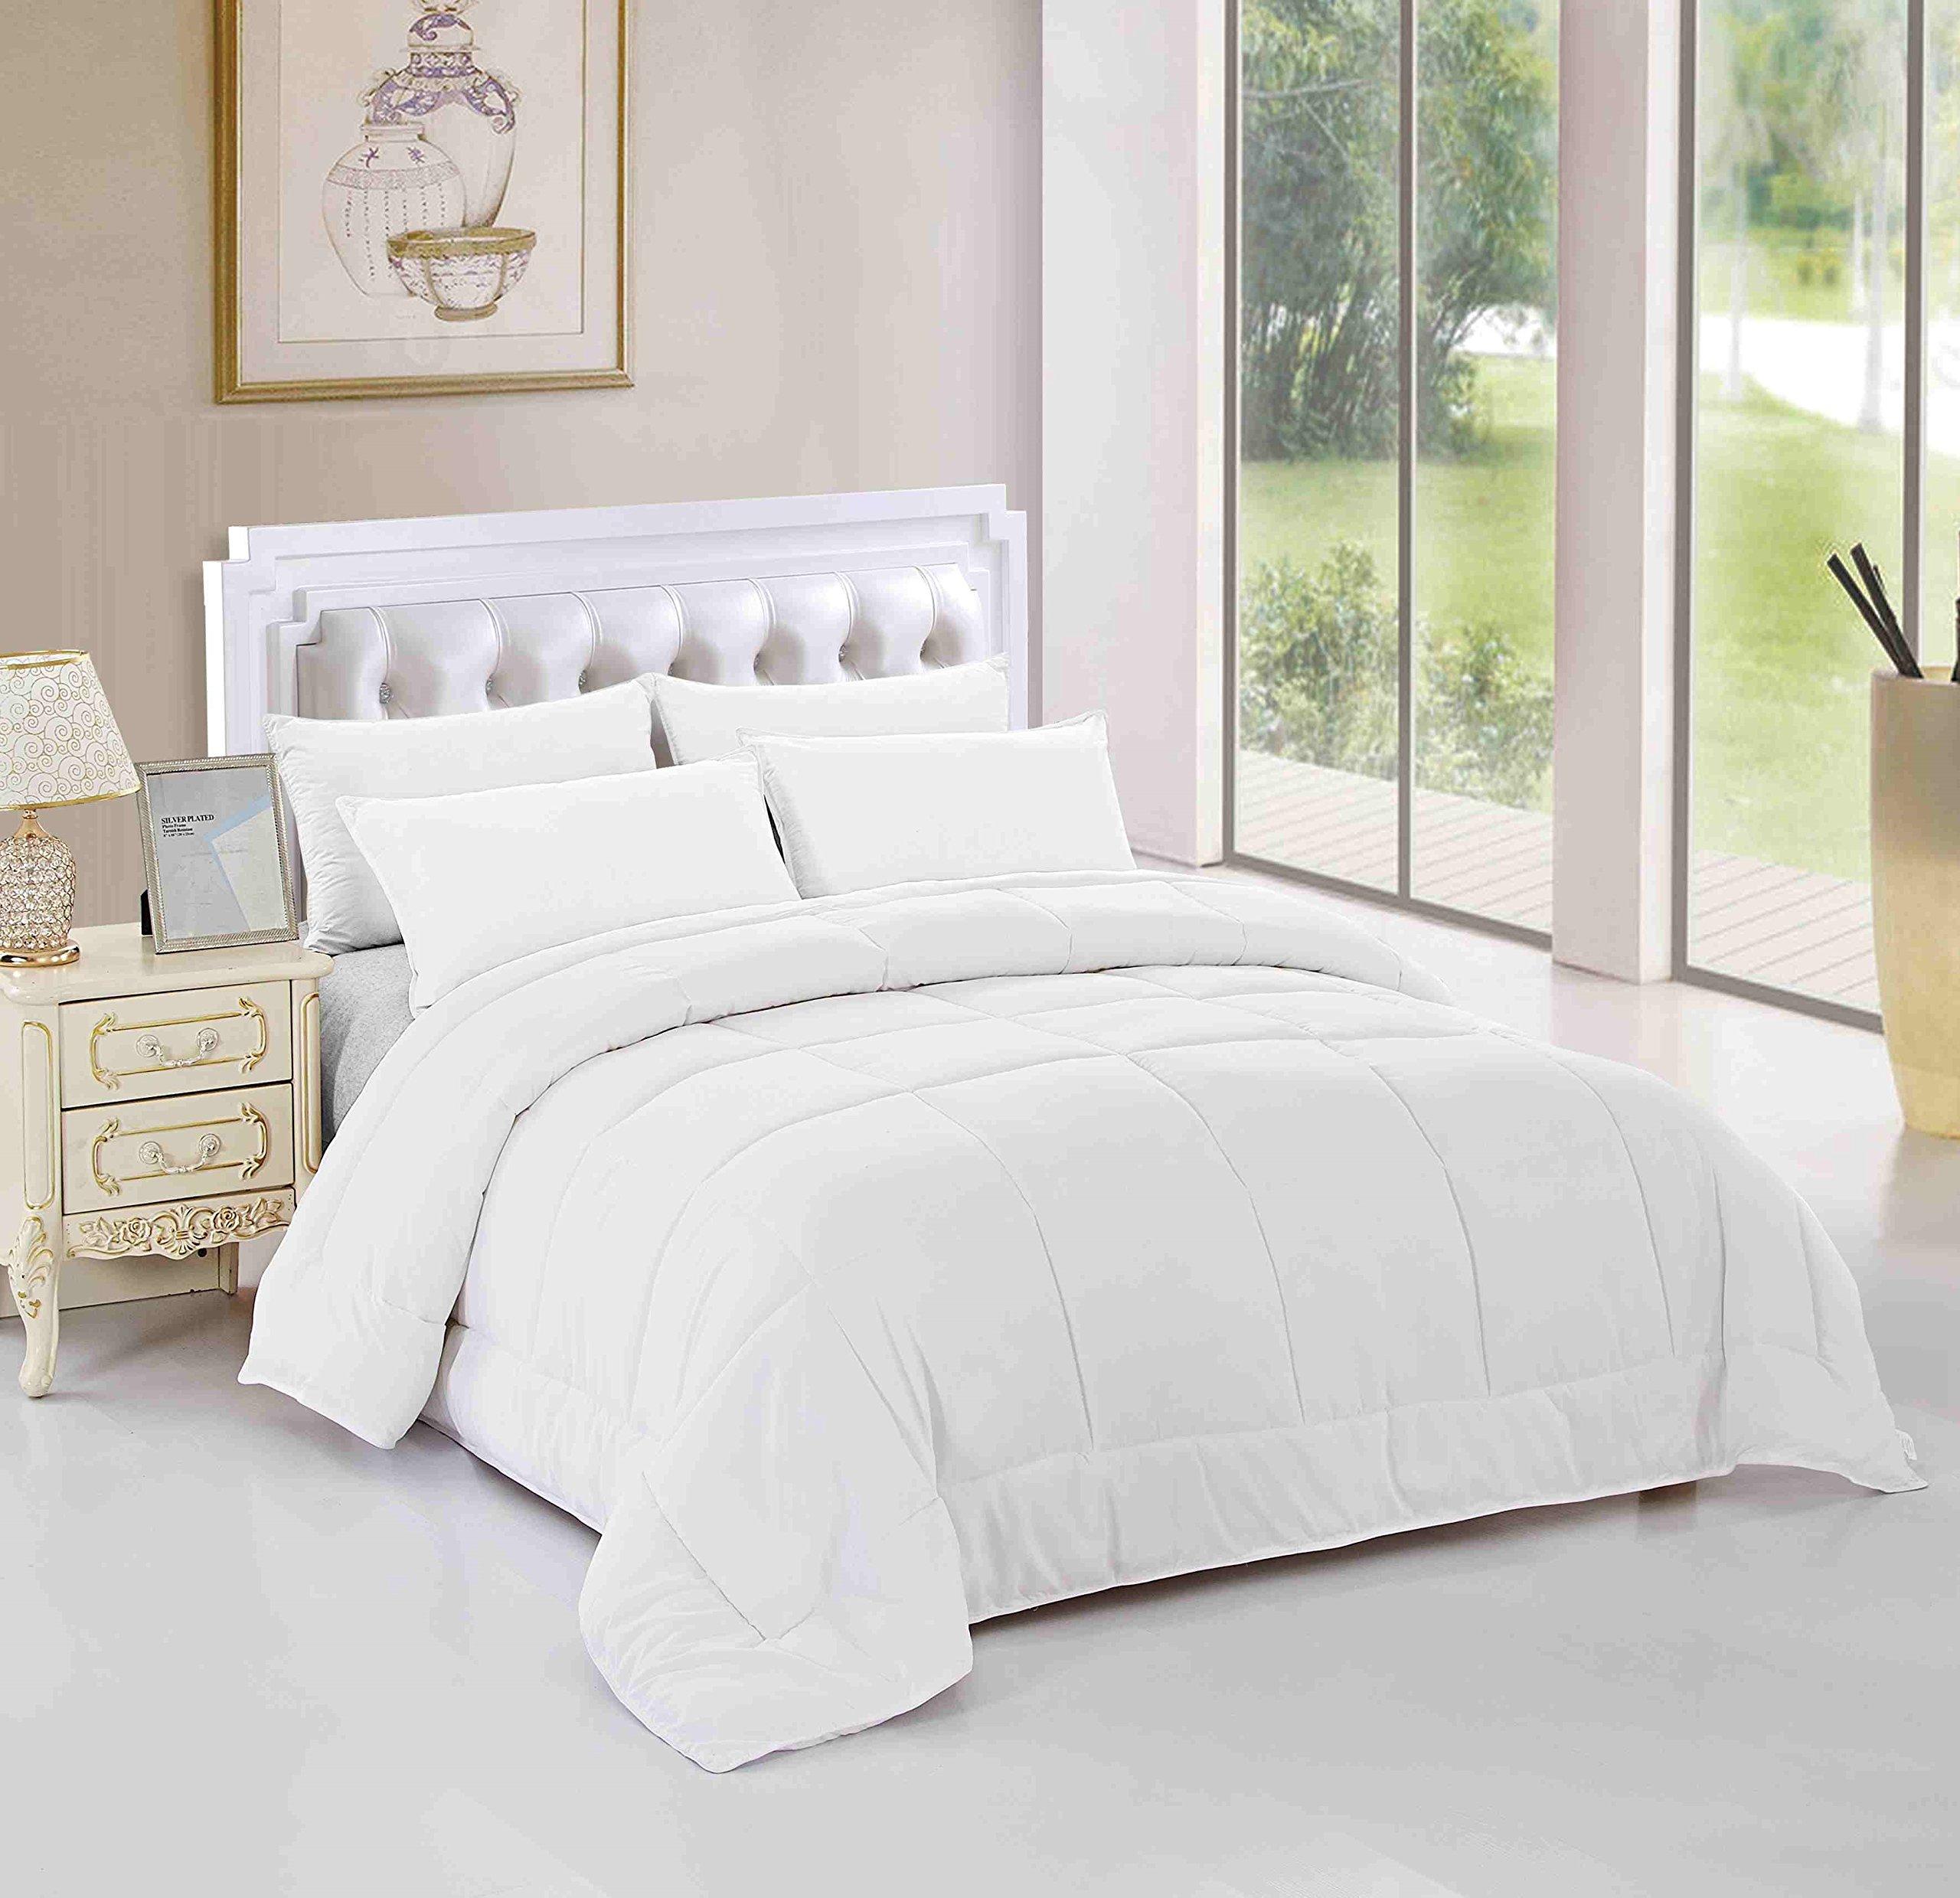 Unique Home All Season Alternative Goose Down Comforter Plush Fiberfill Duvet Insert All Sizes Twin / Twin XL / Queen / King